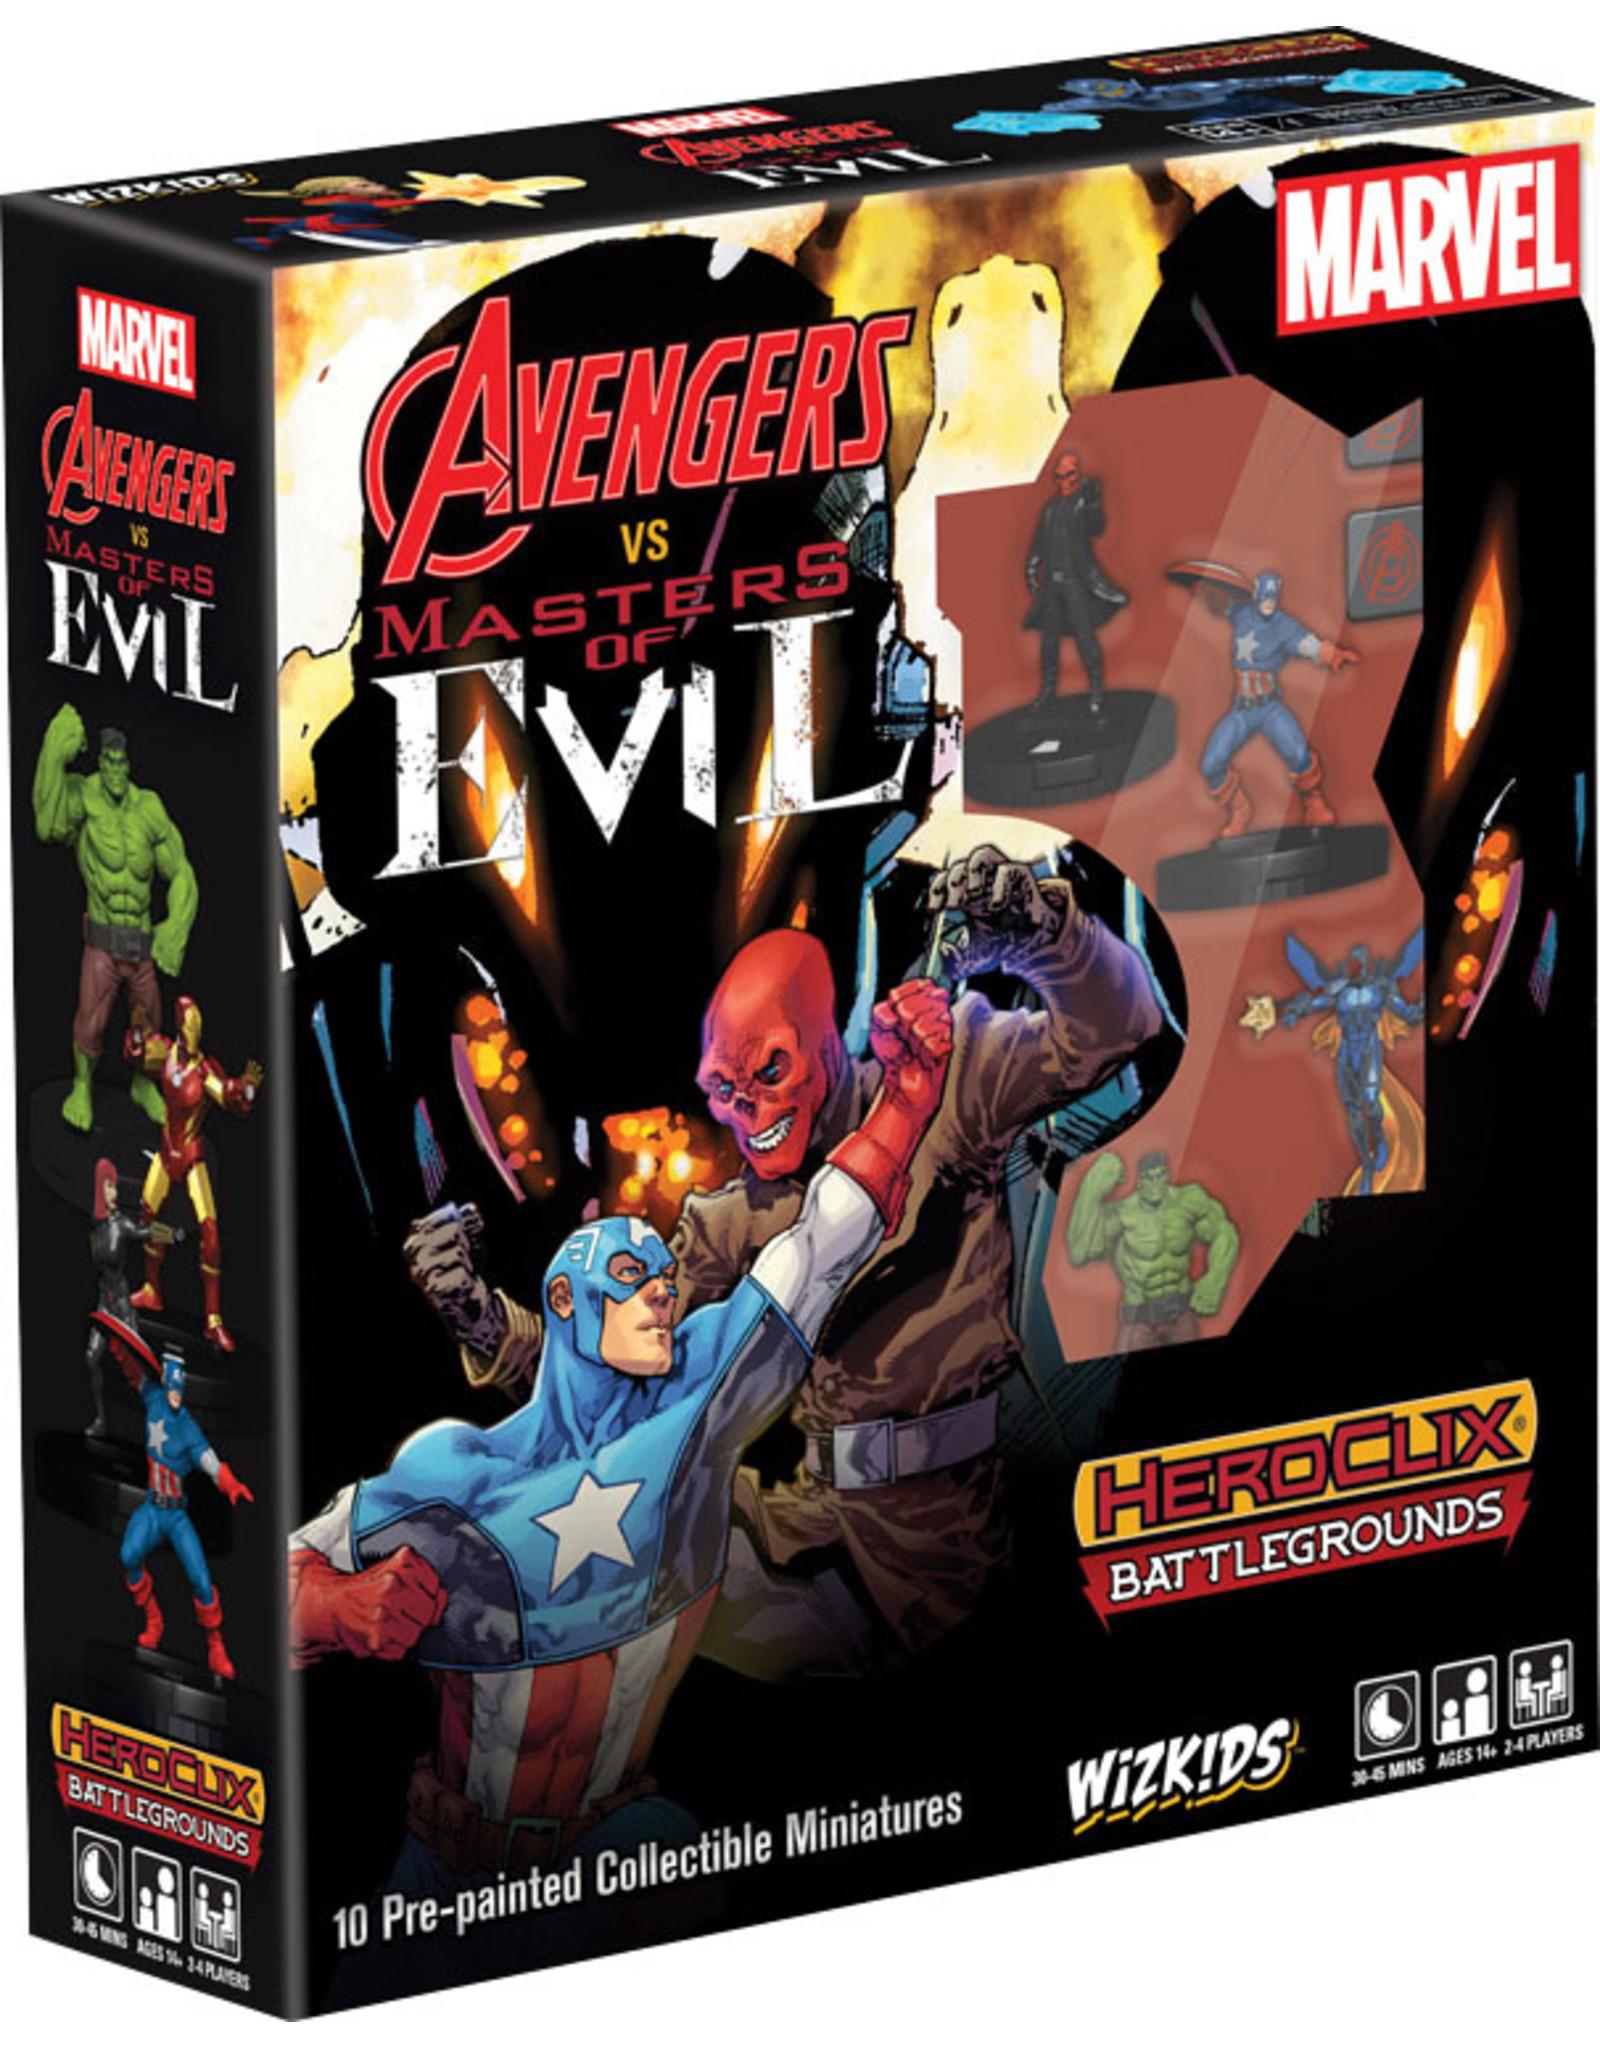 WizKids Marvel HeroClix: Battlegrounds - Avengers vs Masters of Evil